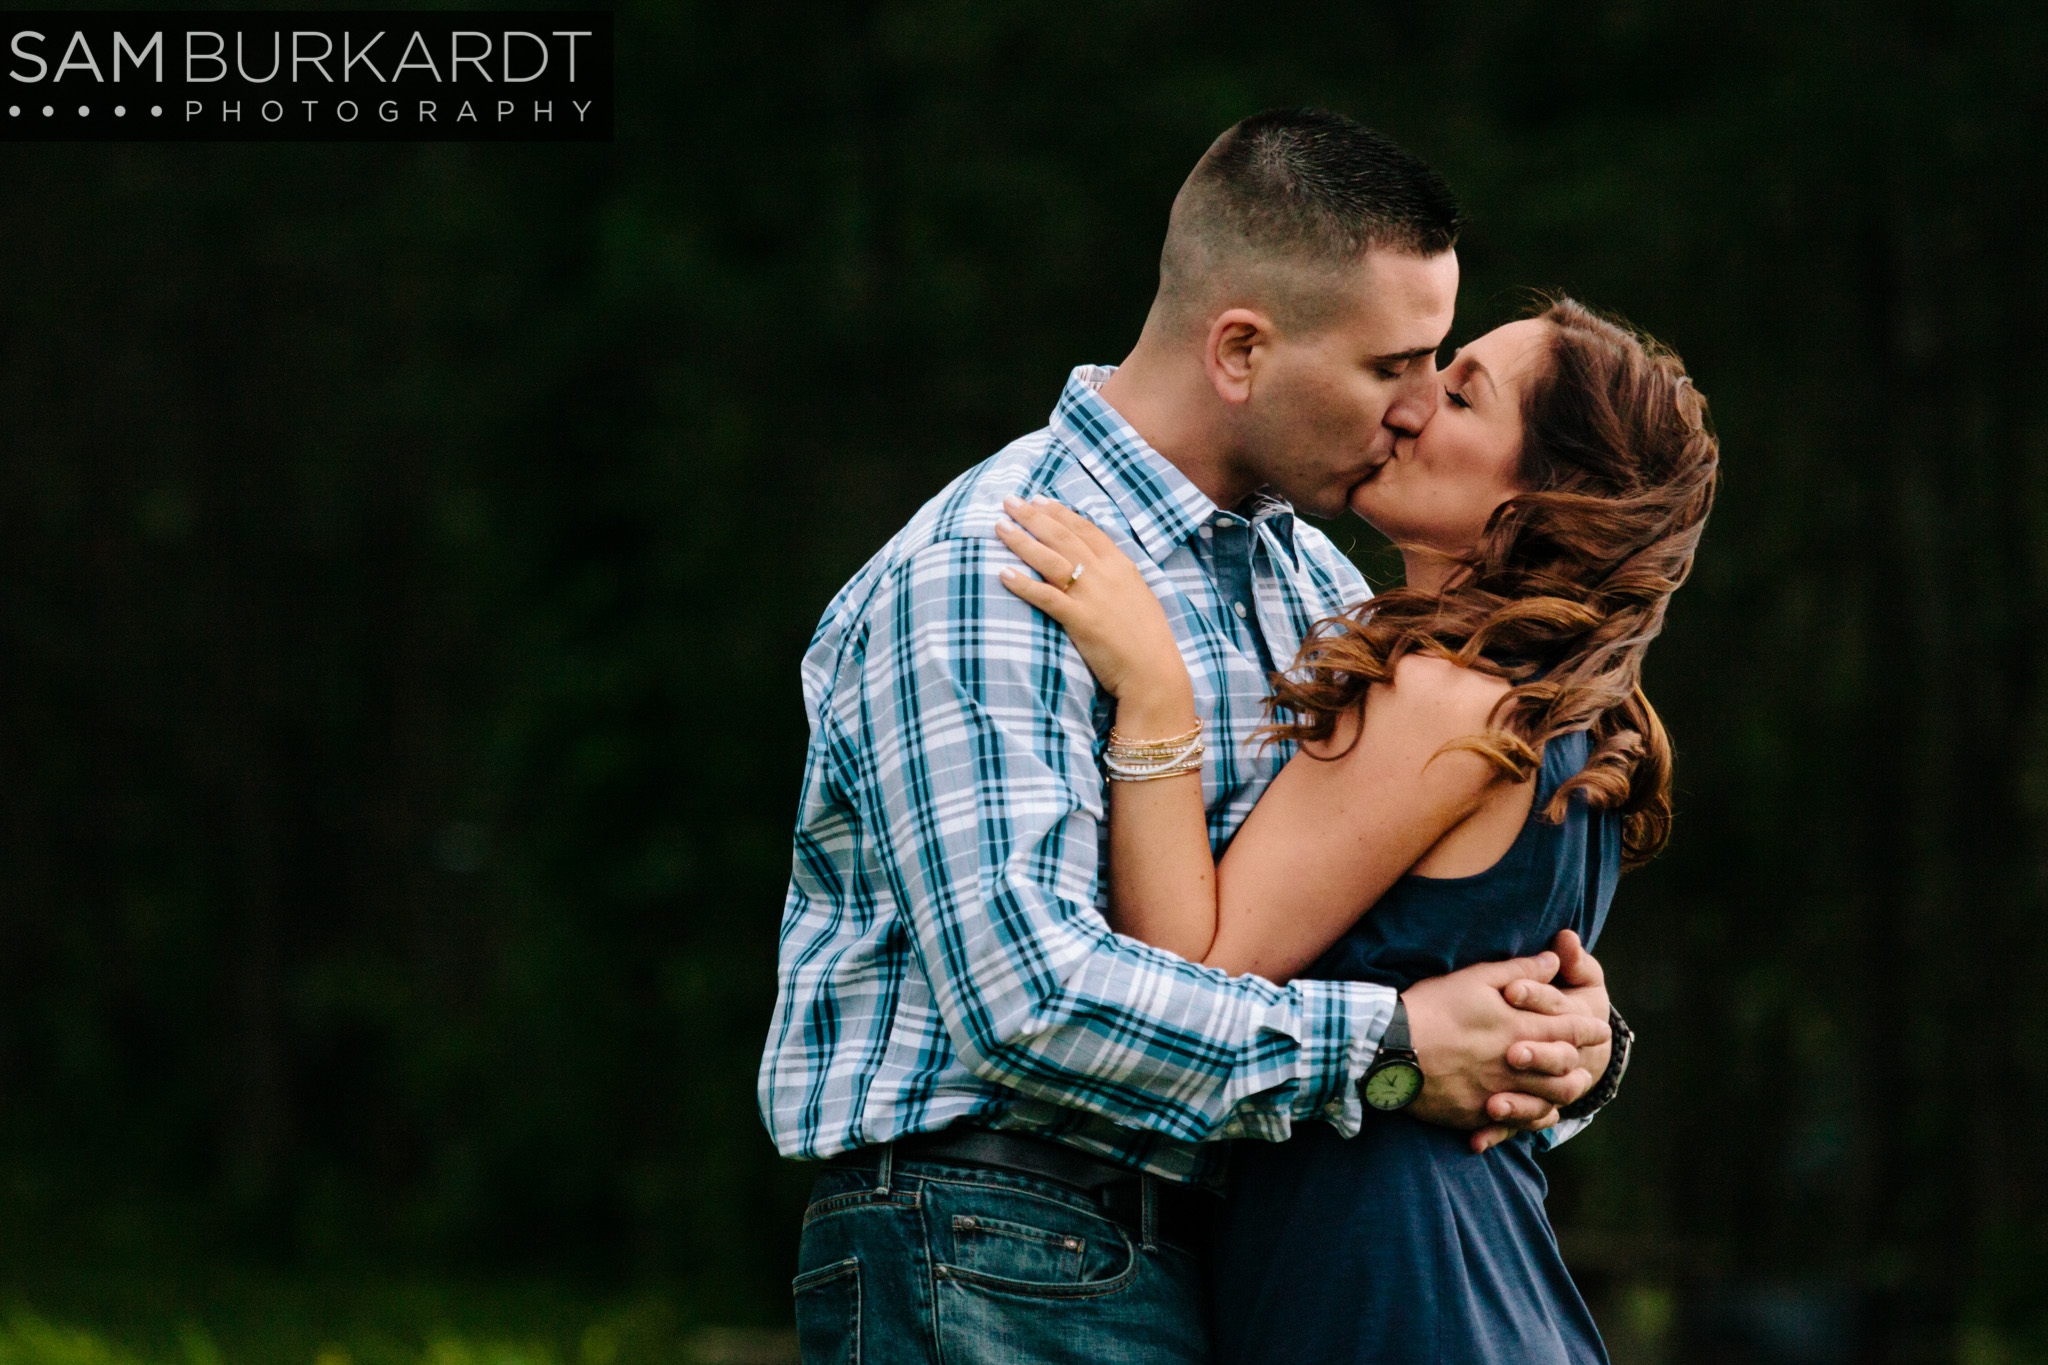 sburkardt_engagement_wedding_candlewood_lake_photography_011.jpg